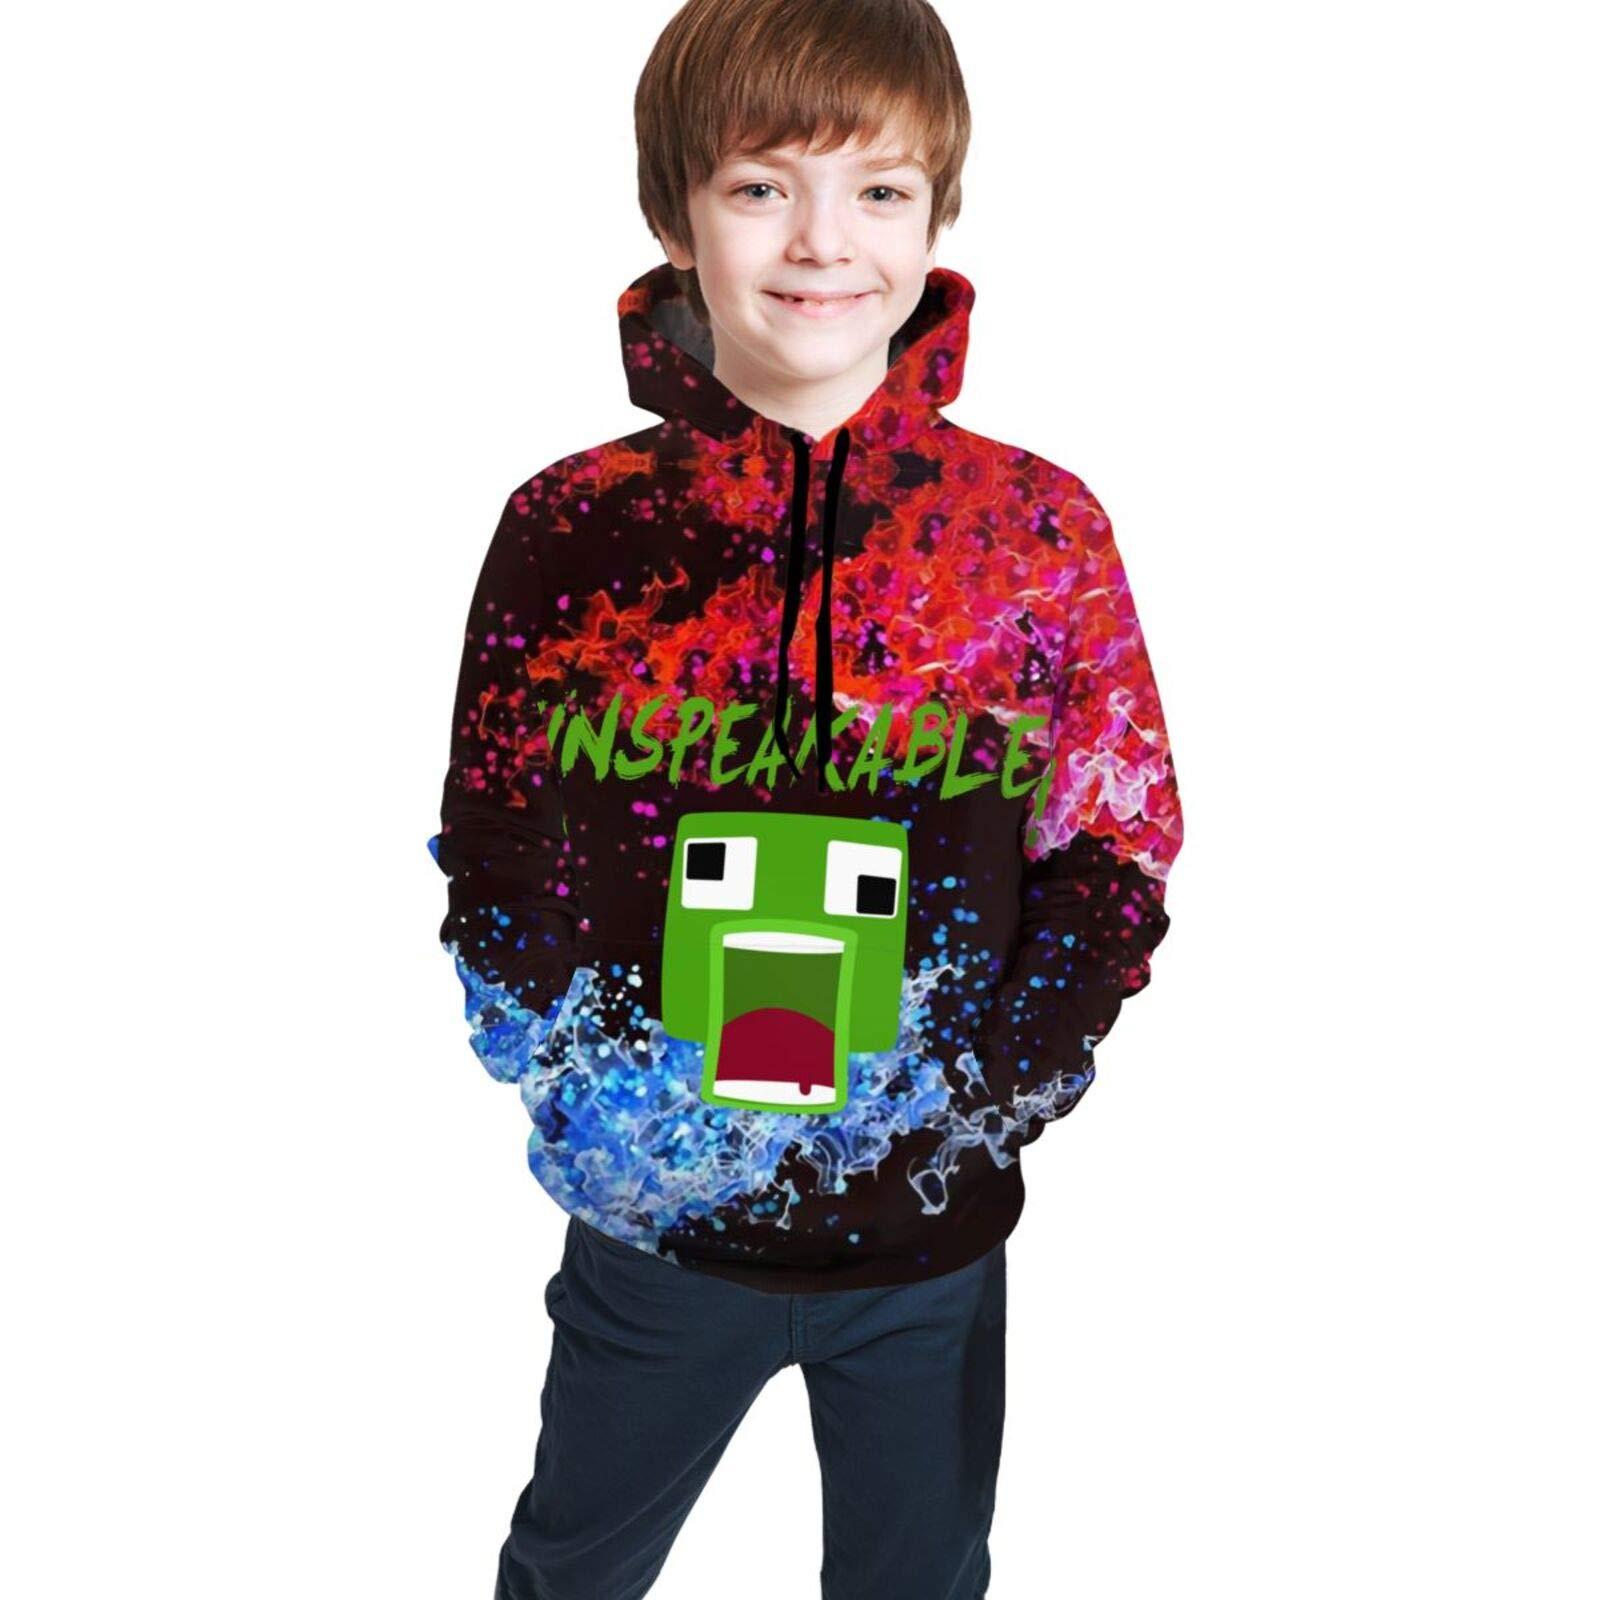 Unspe-Aka-Ble Teen Sweatshirt Shirt With Pocket Kids Hoodie Teen Shirt Unisex Kid Long Sleeve T-Shirt